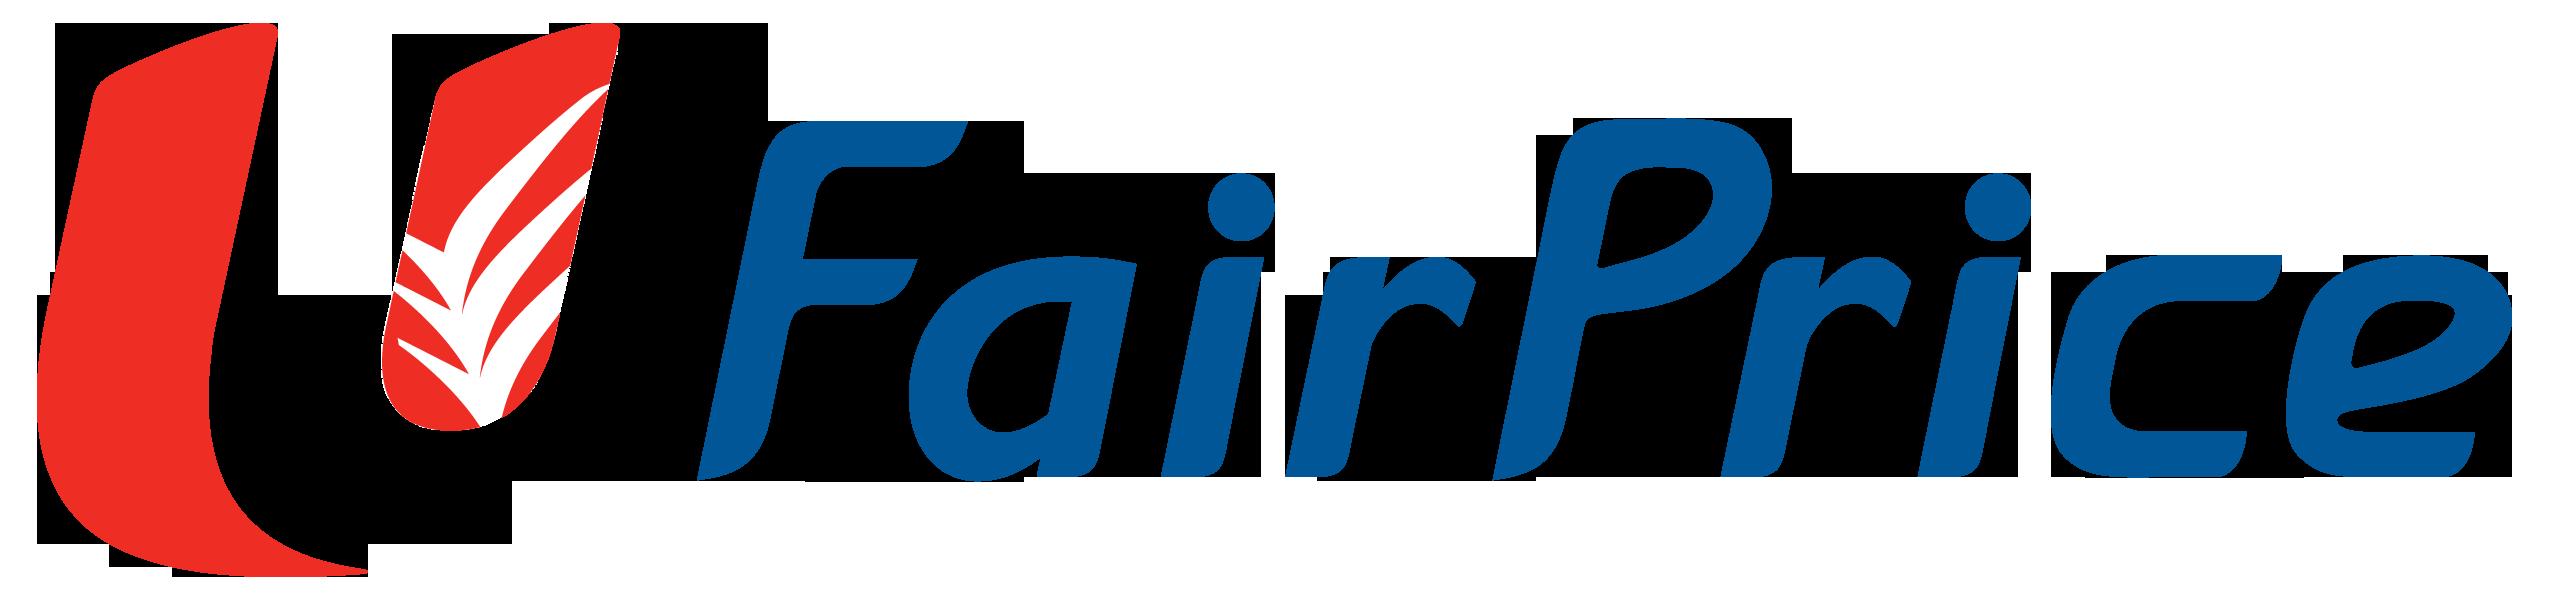 ZOOM LINK - Fairprice Logo PNG - Logo Fairprice PNG